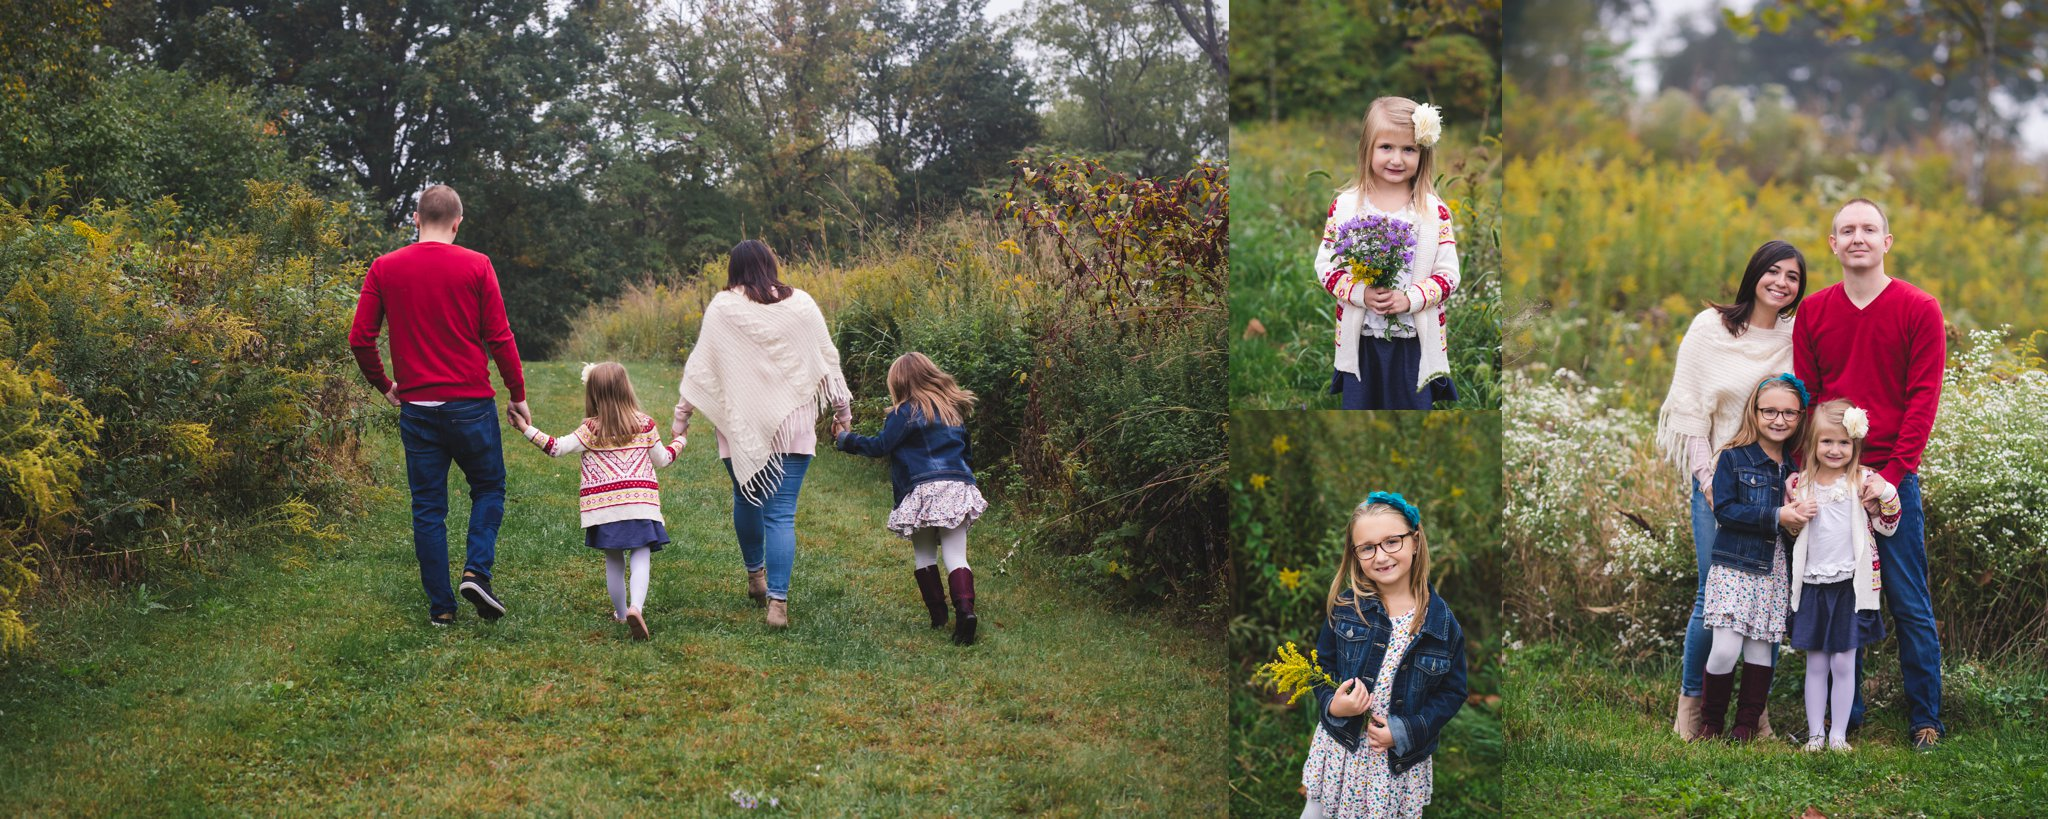 Lehigh Valley Bucks County Philadelphia Family Photographer